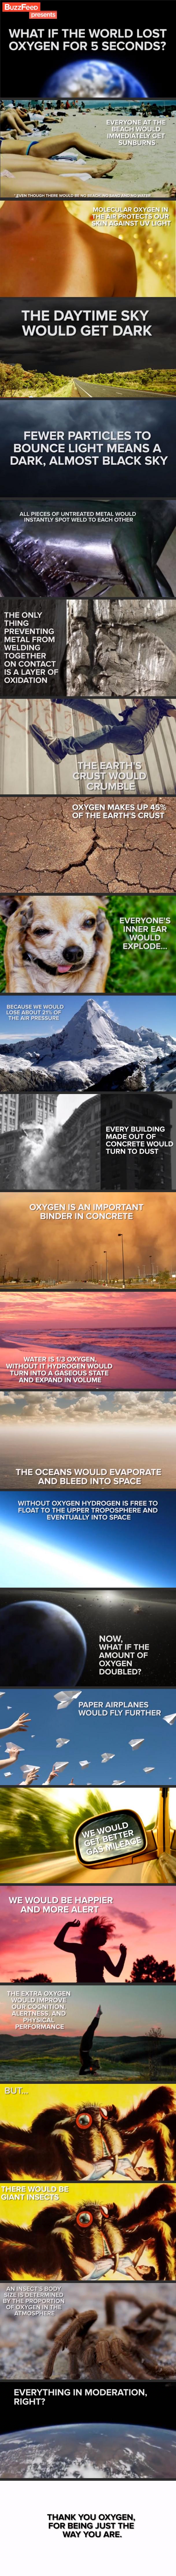 oxygen is important. .. Aren't spiders arachnids? oxygen is important Aren't spiders arachnids?